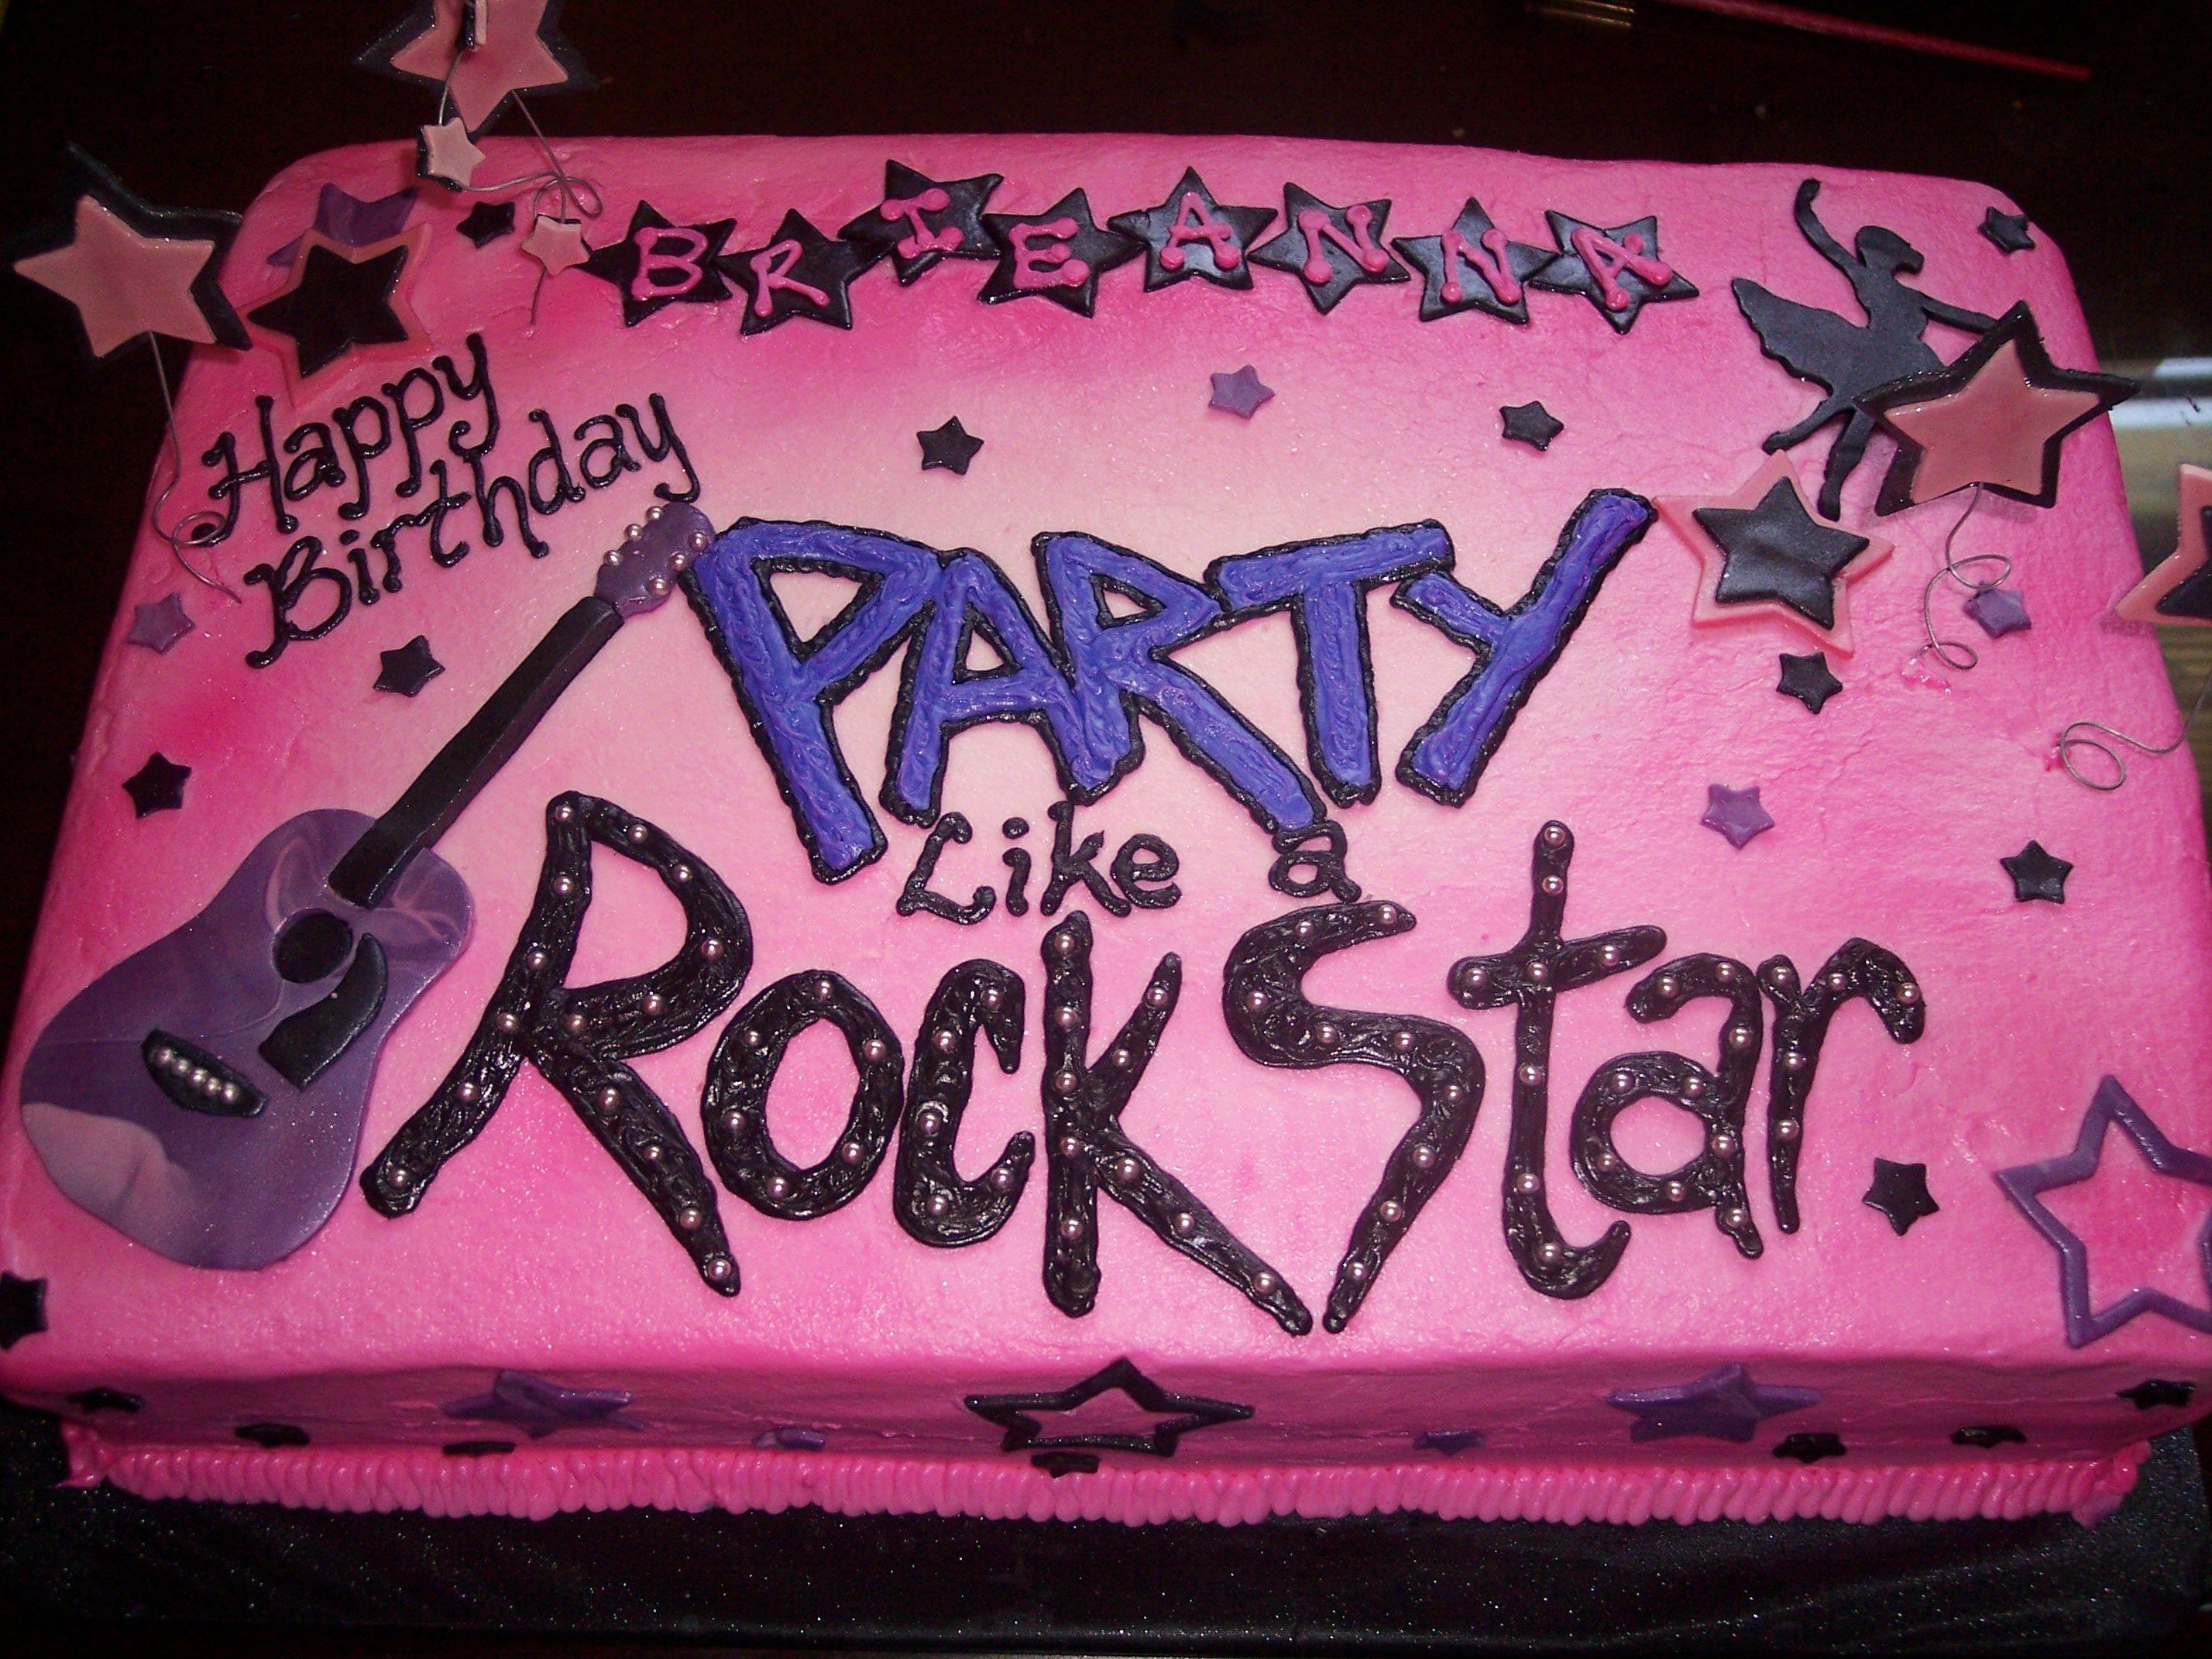 Miraculous Party Like A Rock Star Rockstar Birthday Party Rock Star Funny Birthday Cards Online Kookostrdamsfinfo